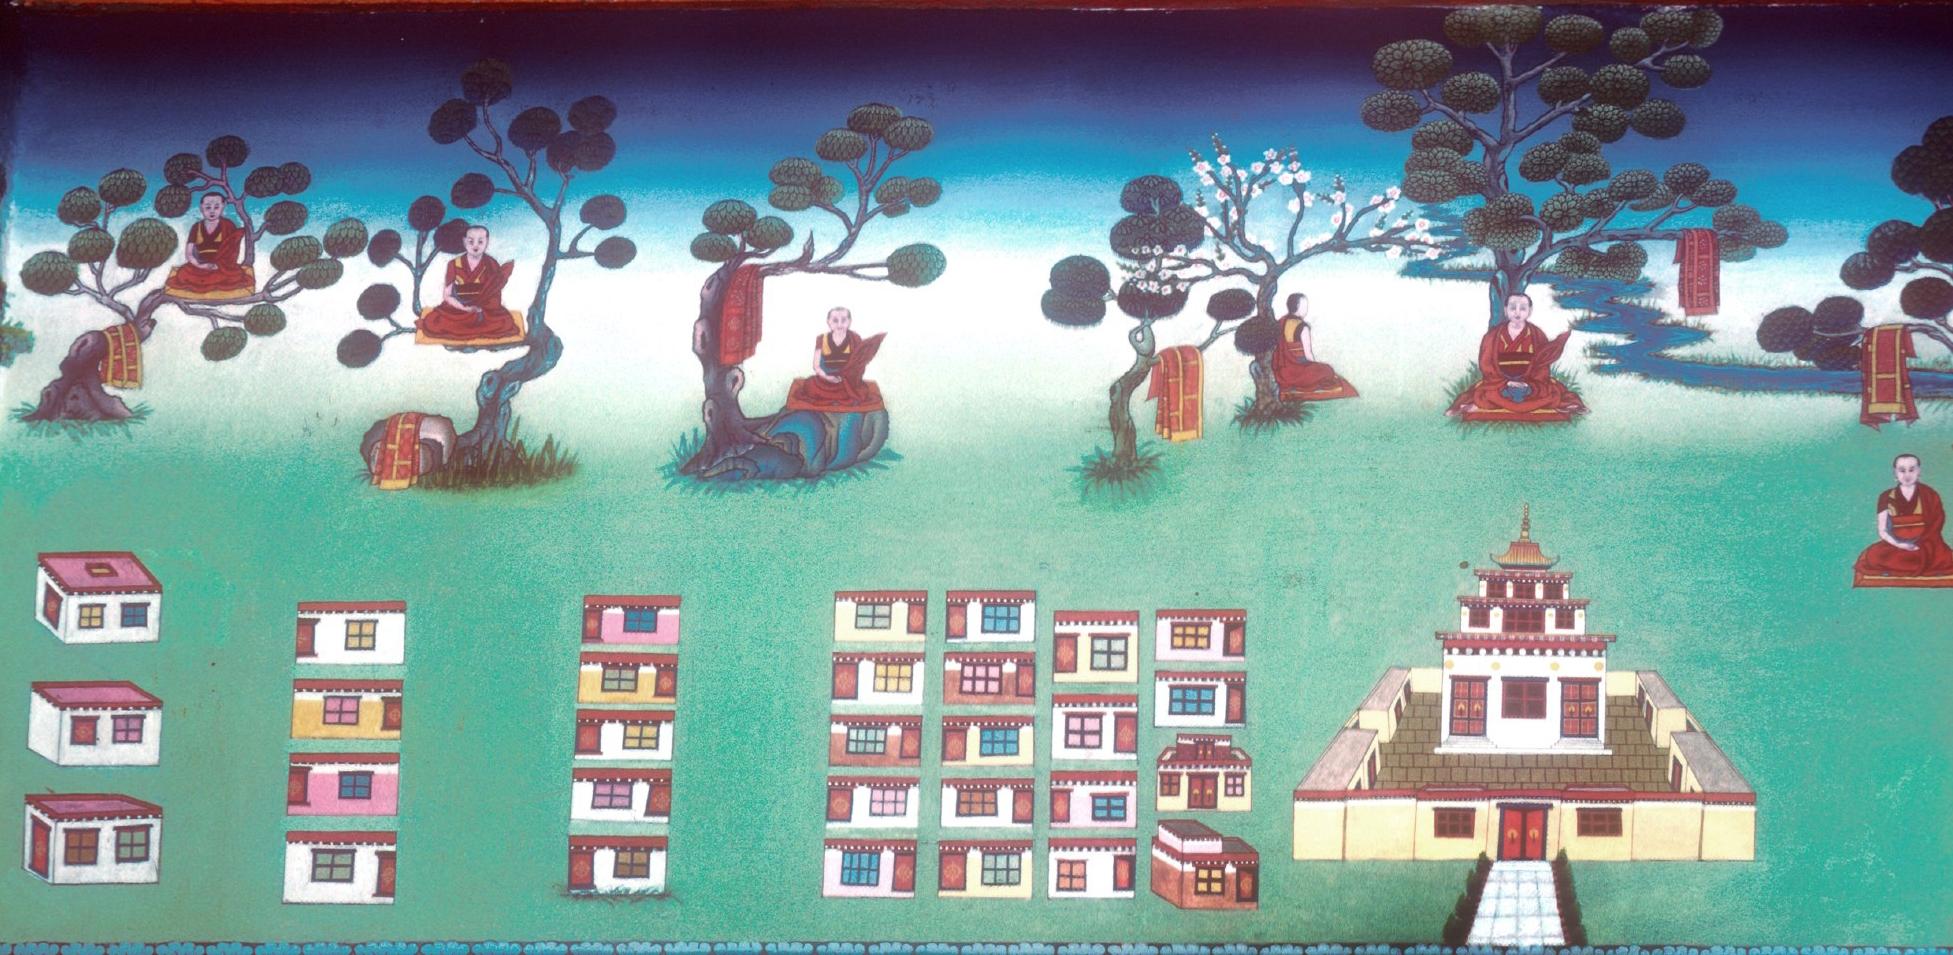 Vinaya rules for monastics